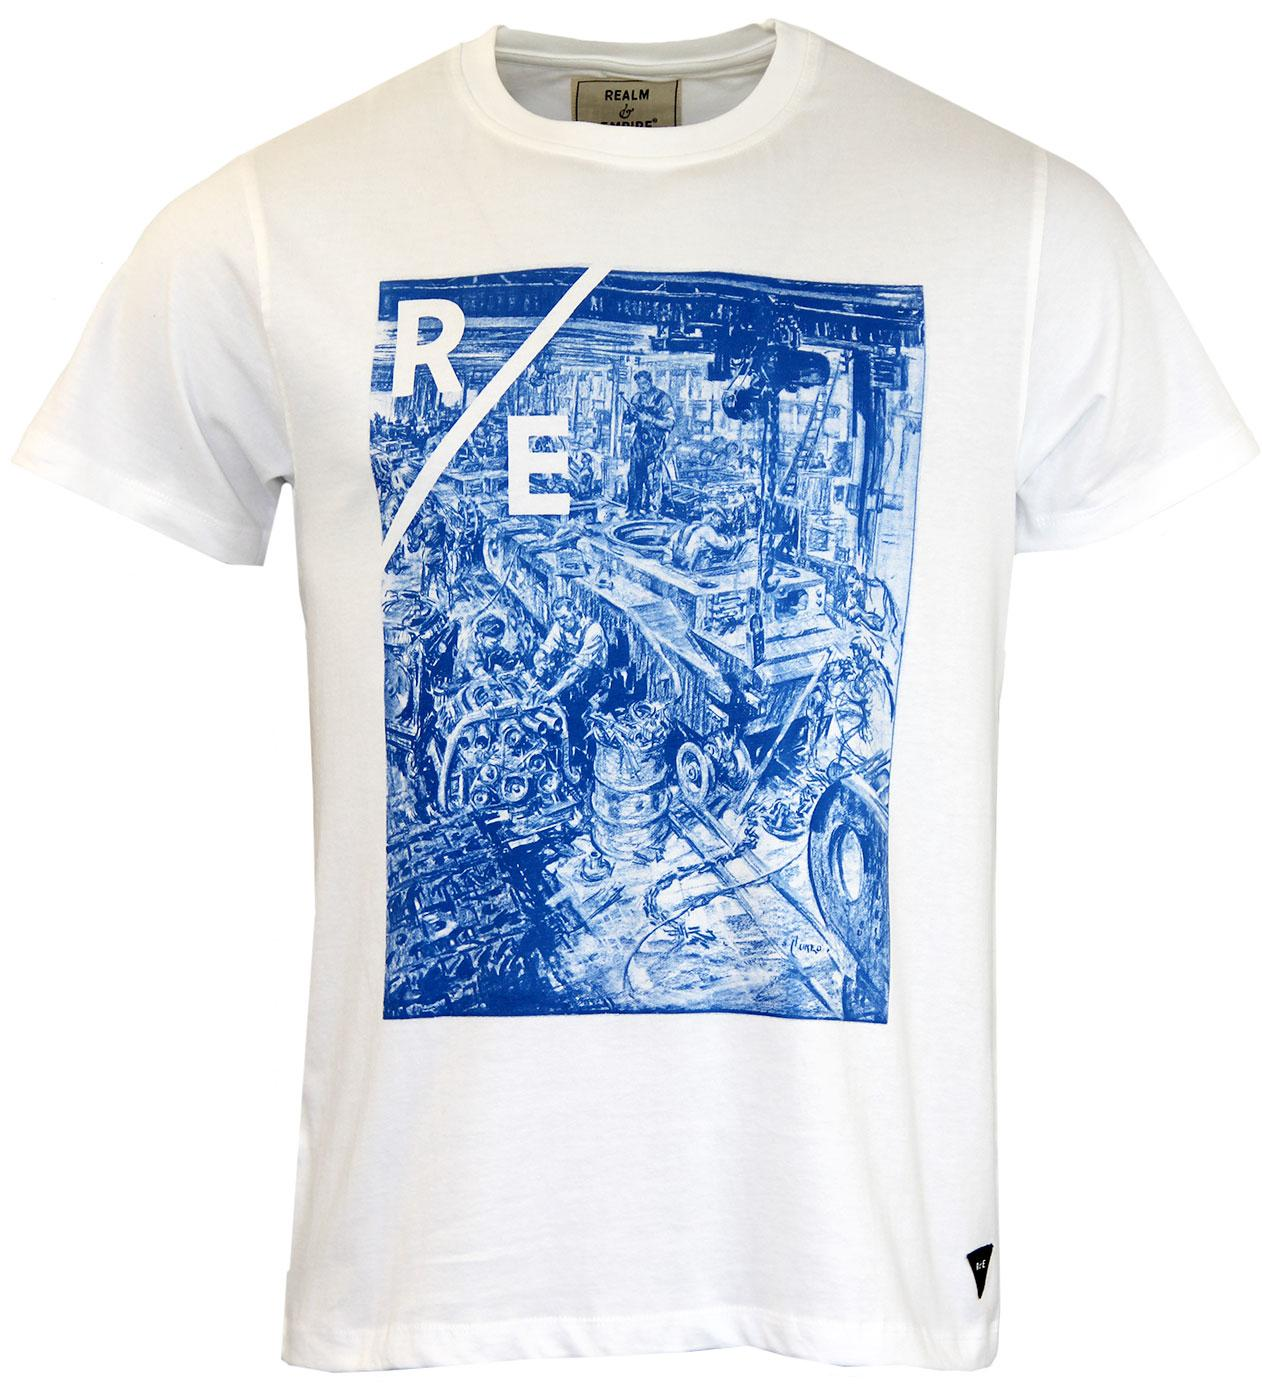 REALM & EMPIRE Hornby Tank Worshop Vintage T-shirt